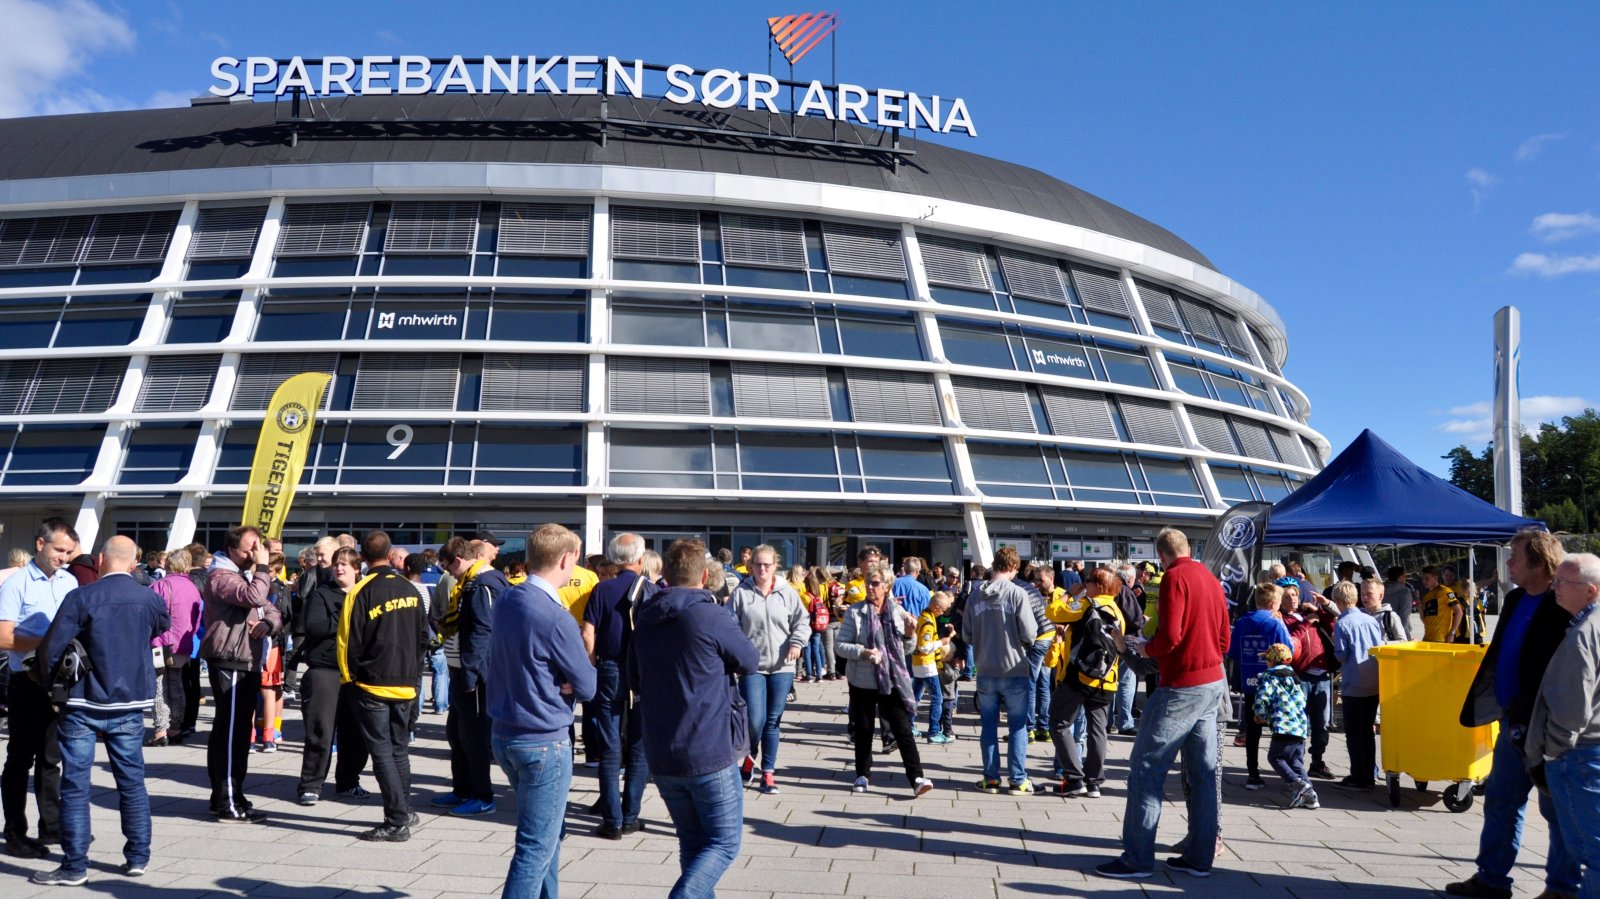 Sparebanken Sør Arena, Jubileumskamp 2015